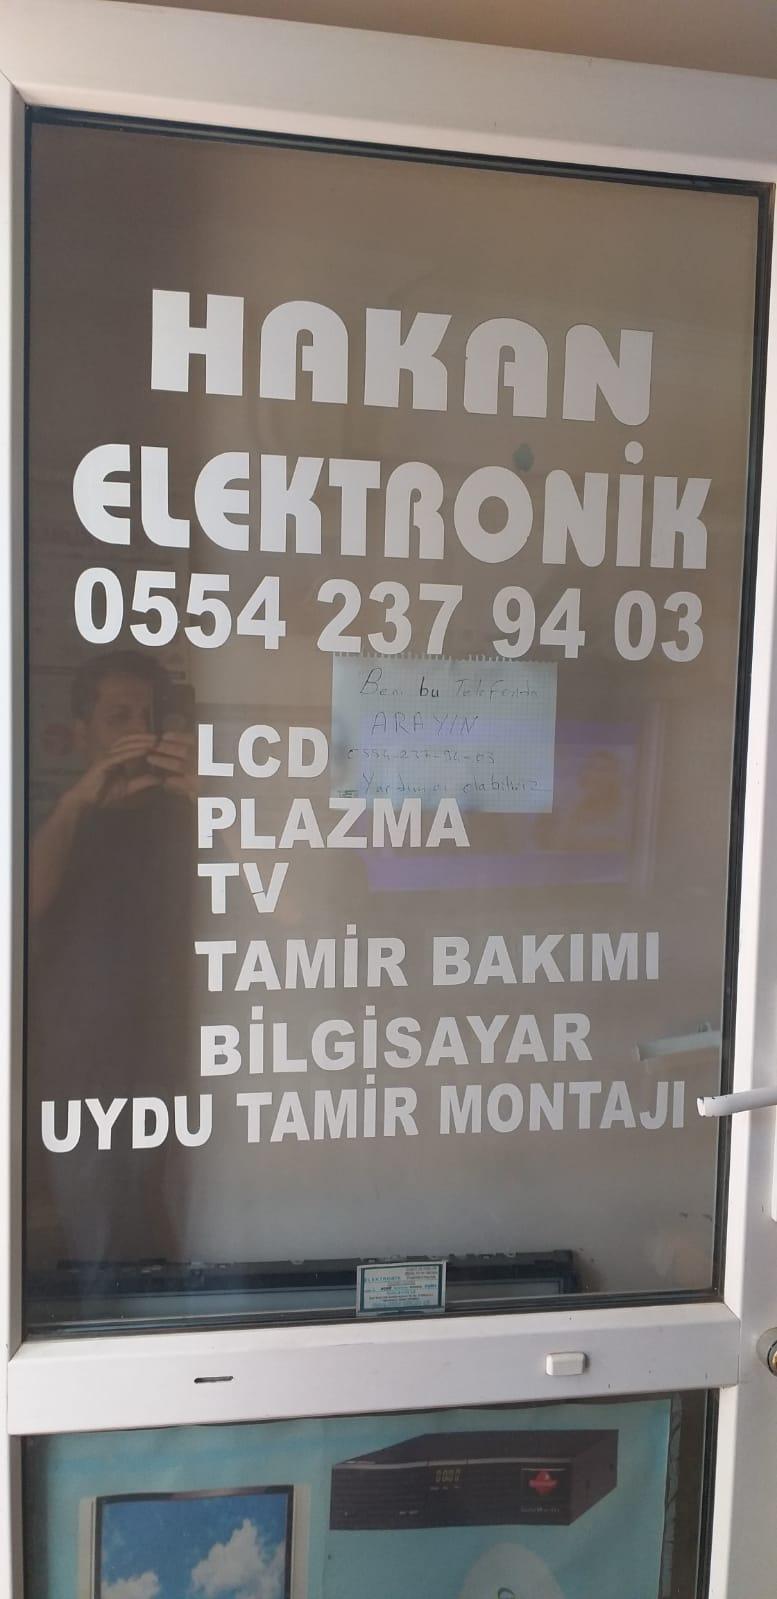 Hakan Elektronik Televizyon Tamir Servis